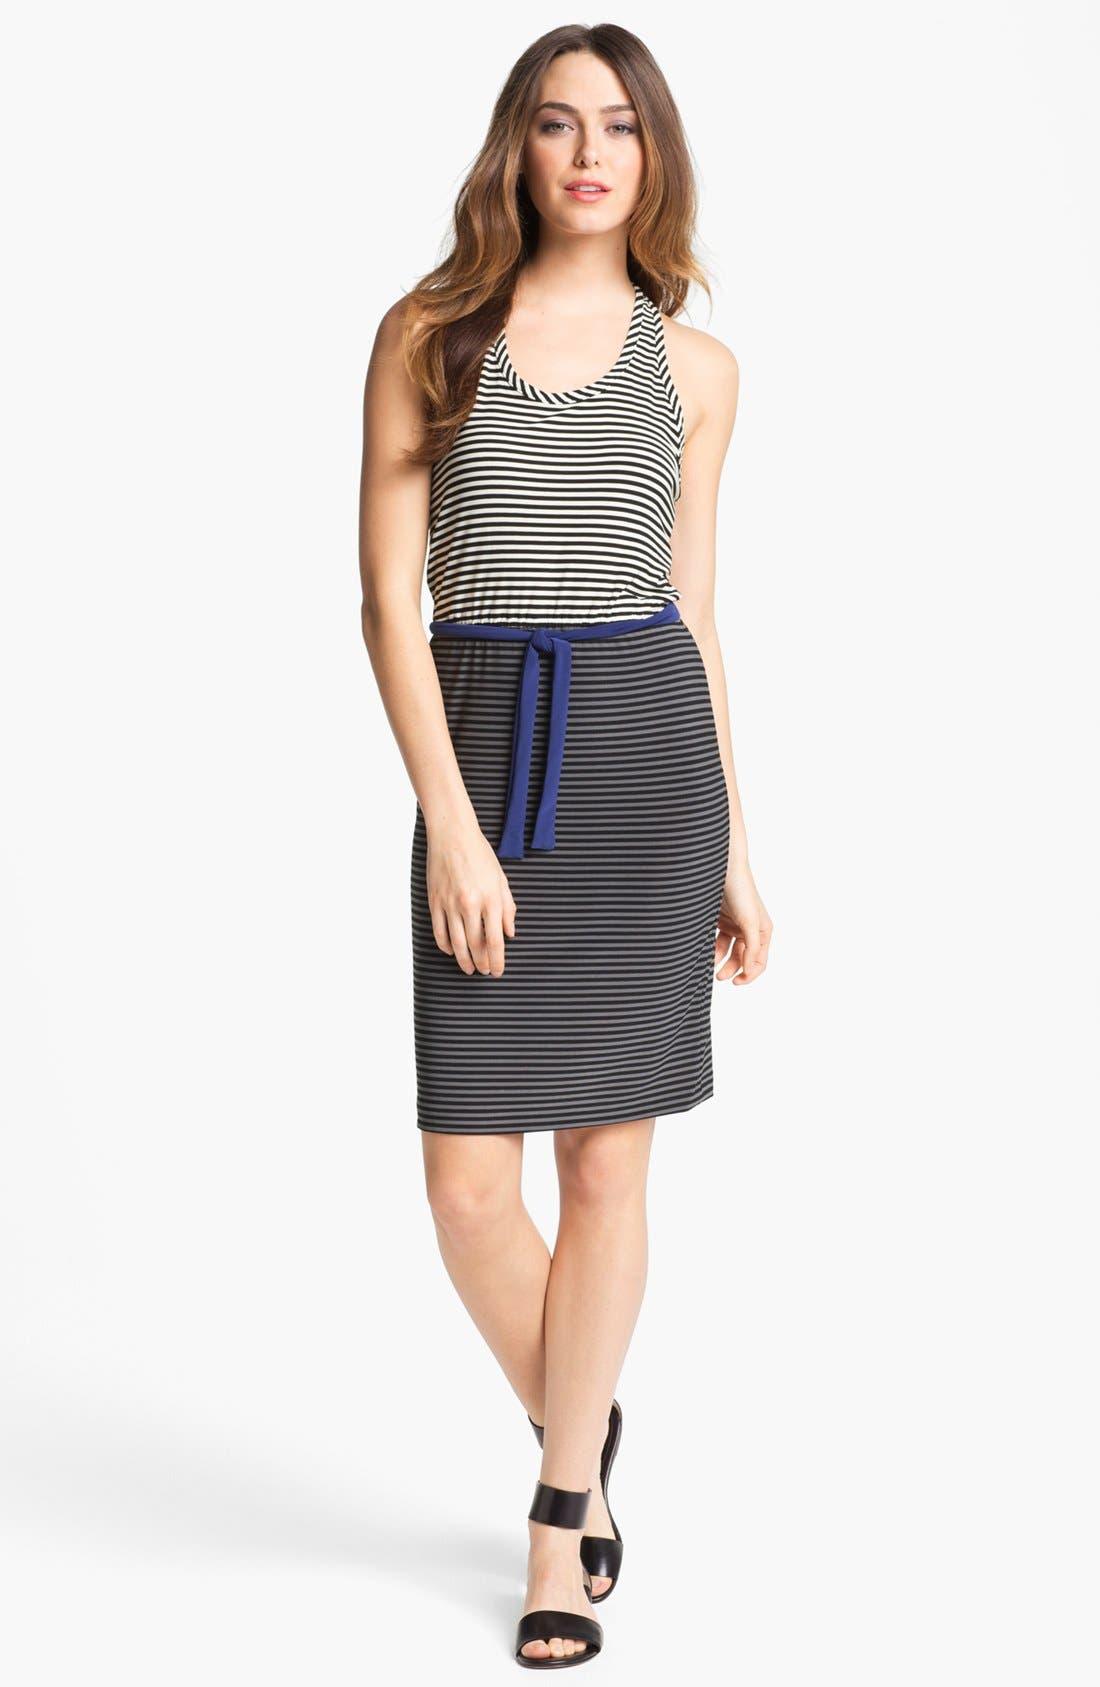 Alternate Image 1 Selected - KAMALIKULTURE Stripe Racerback Tank Dress